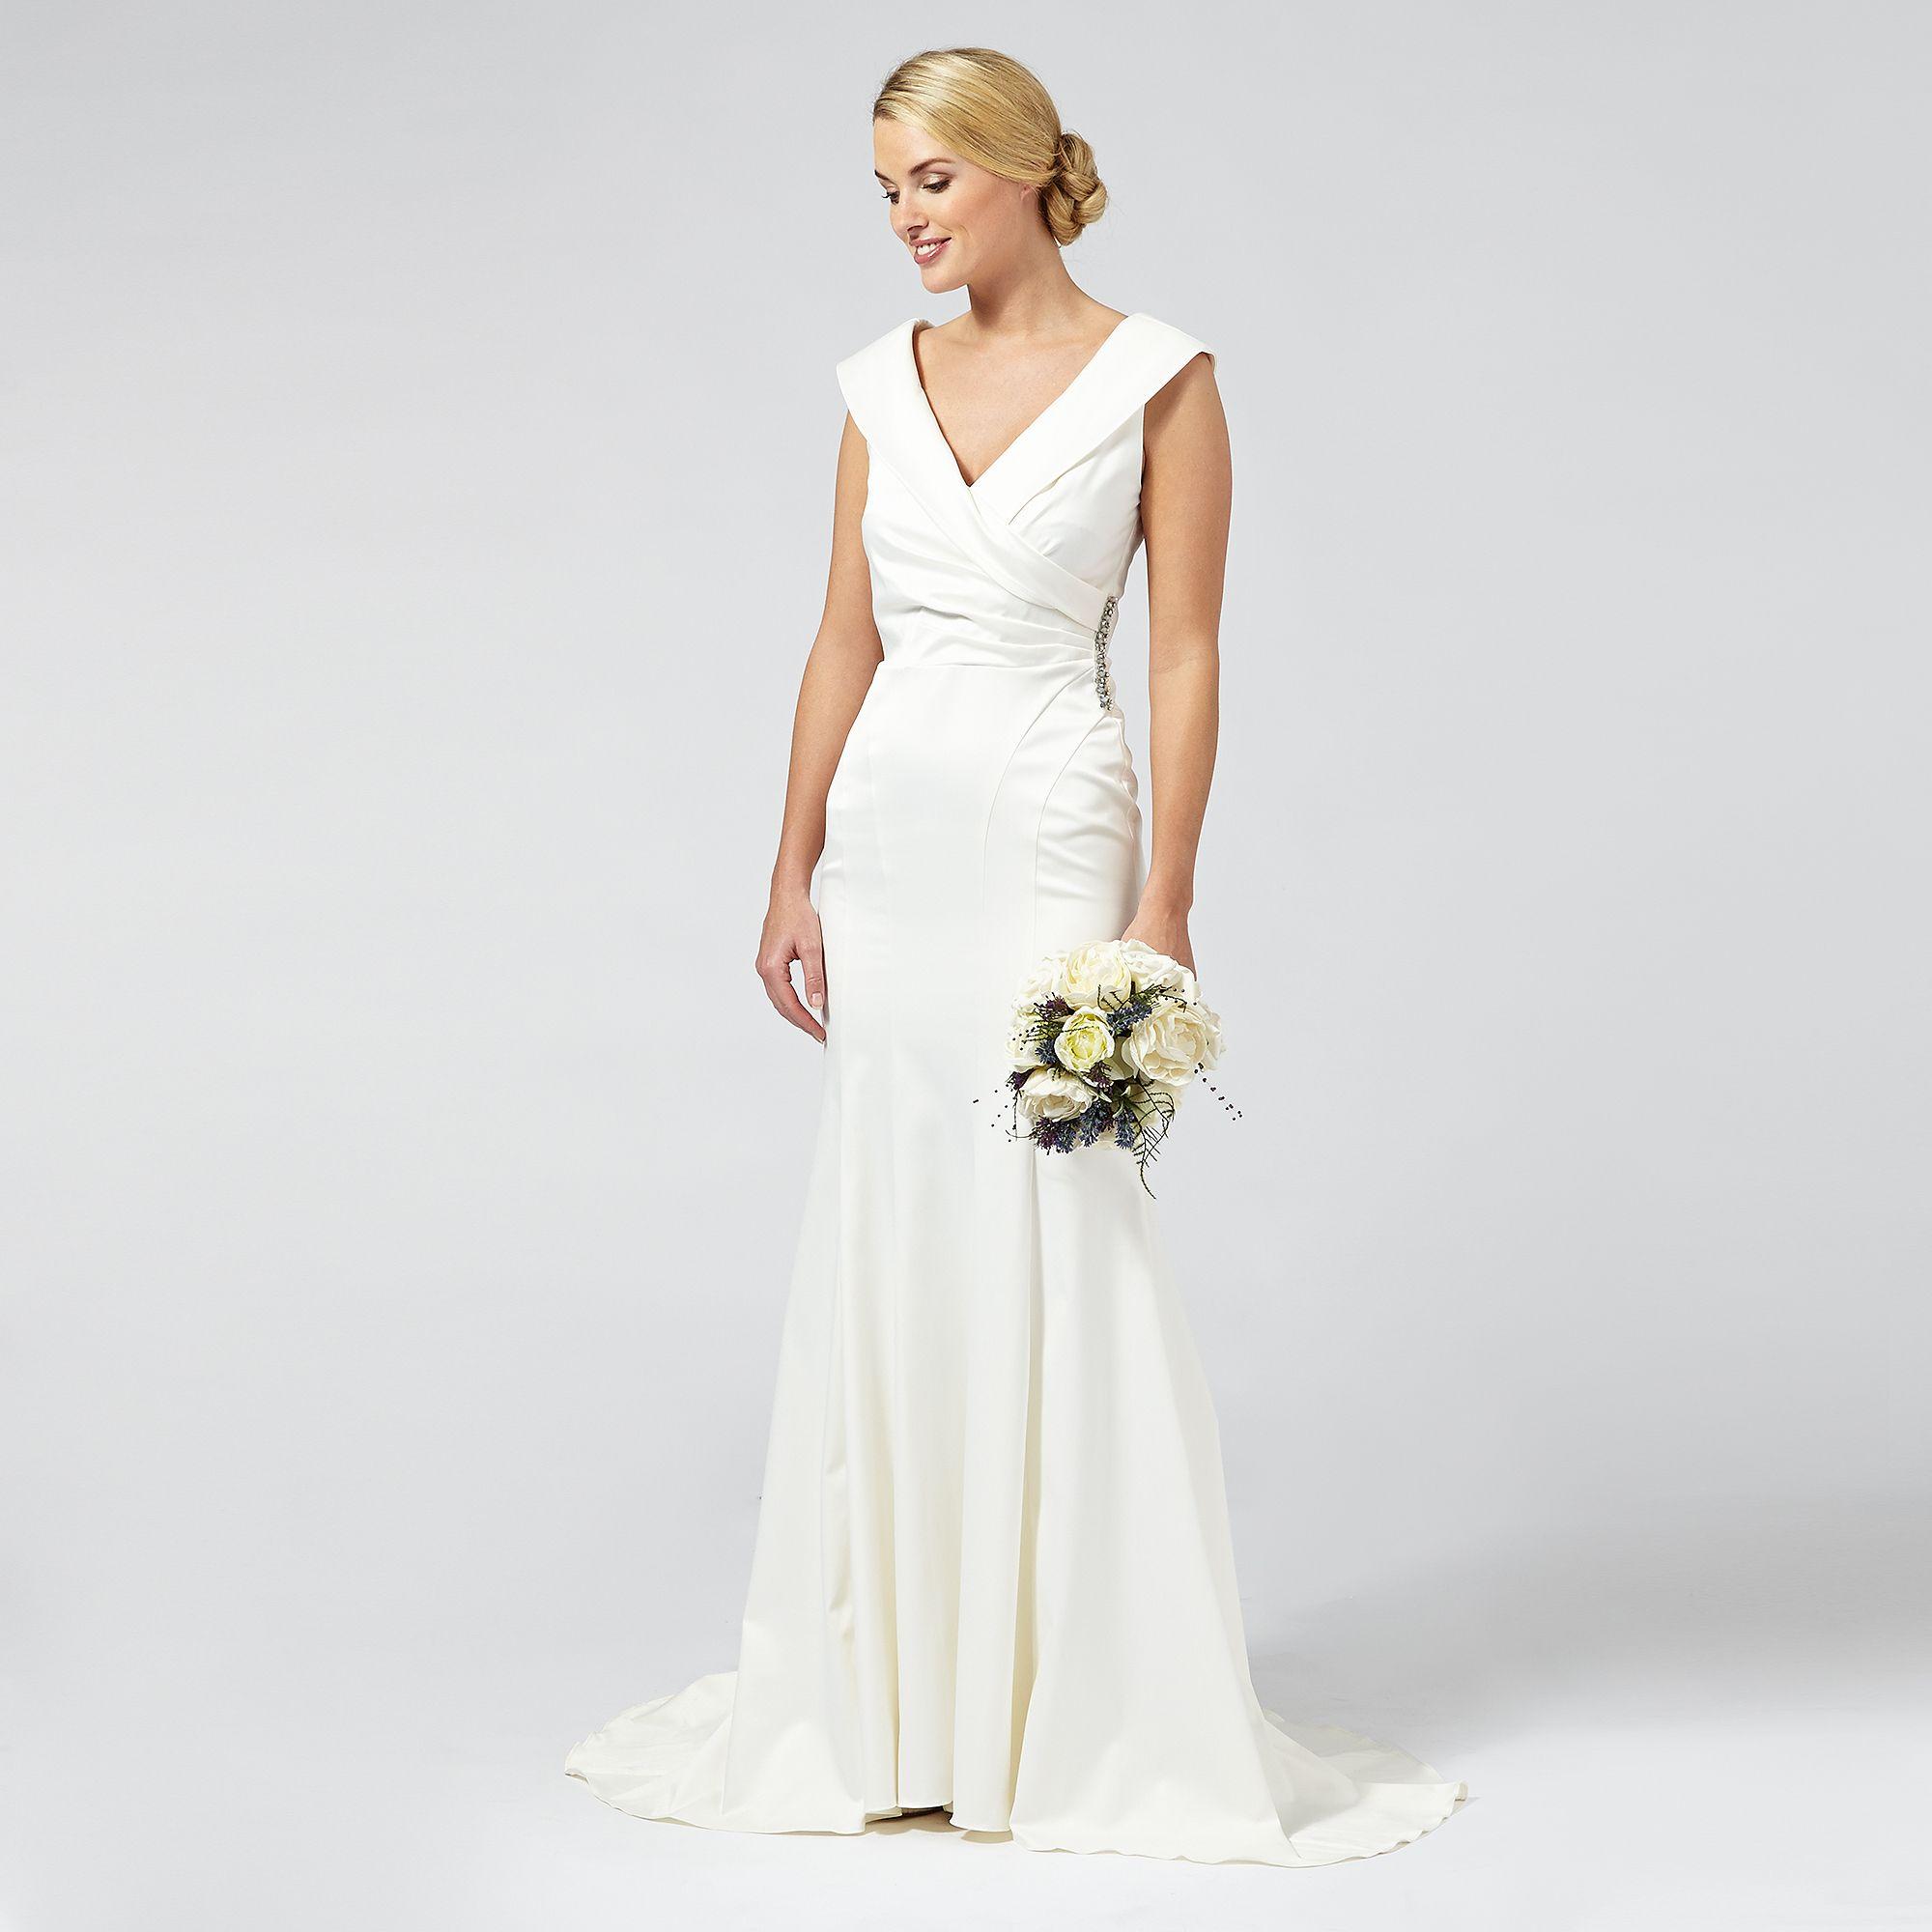 Debut Womens Samantha Satin Bridal Dress From Debenhams Ebay